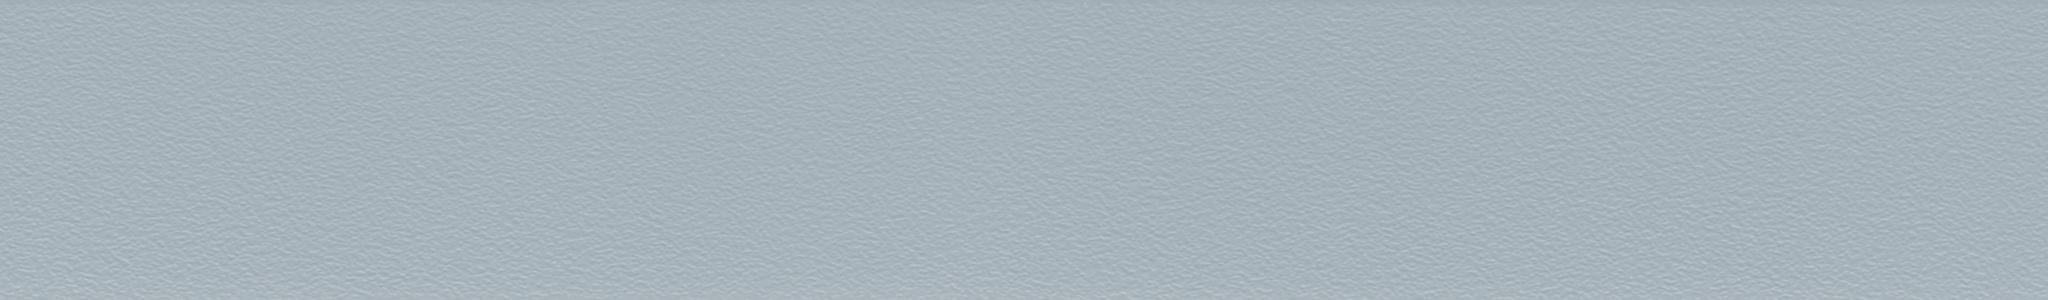 HU 17788 ABS-rand arctisch grijs parel XG